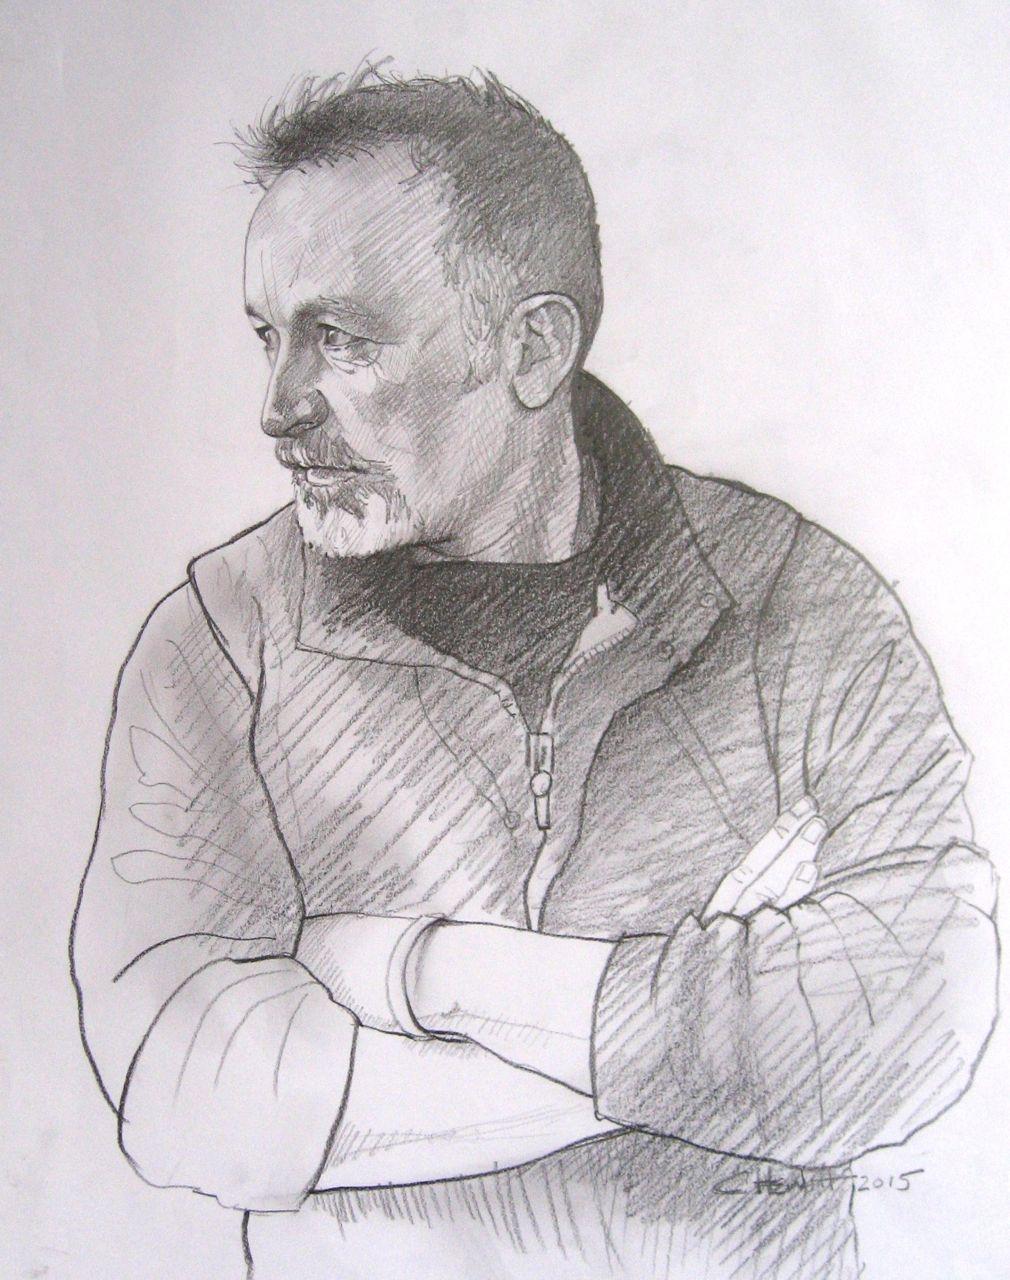 'Ian' - sketch for portrait.